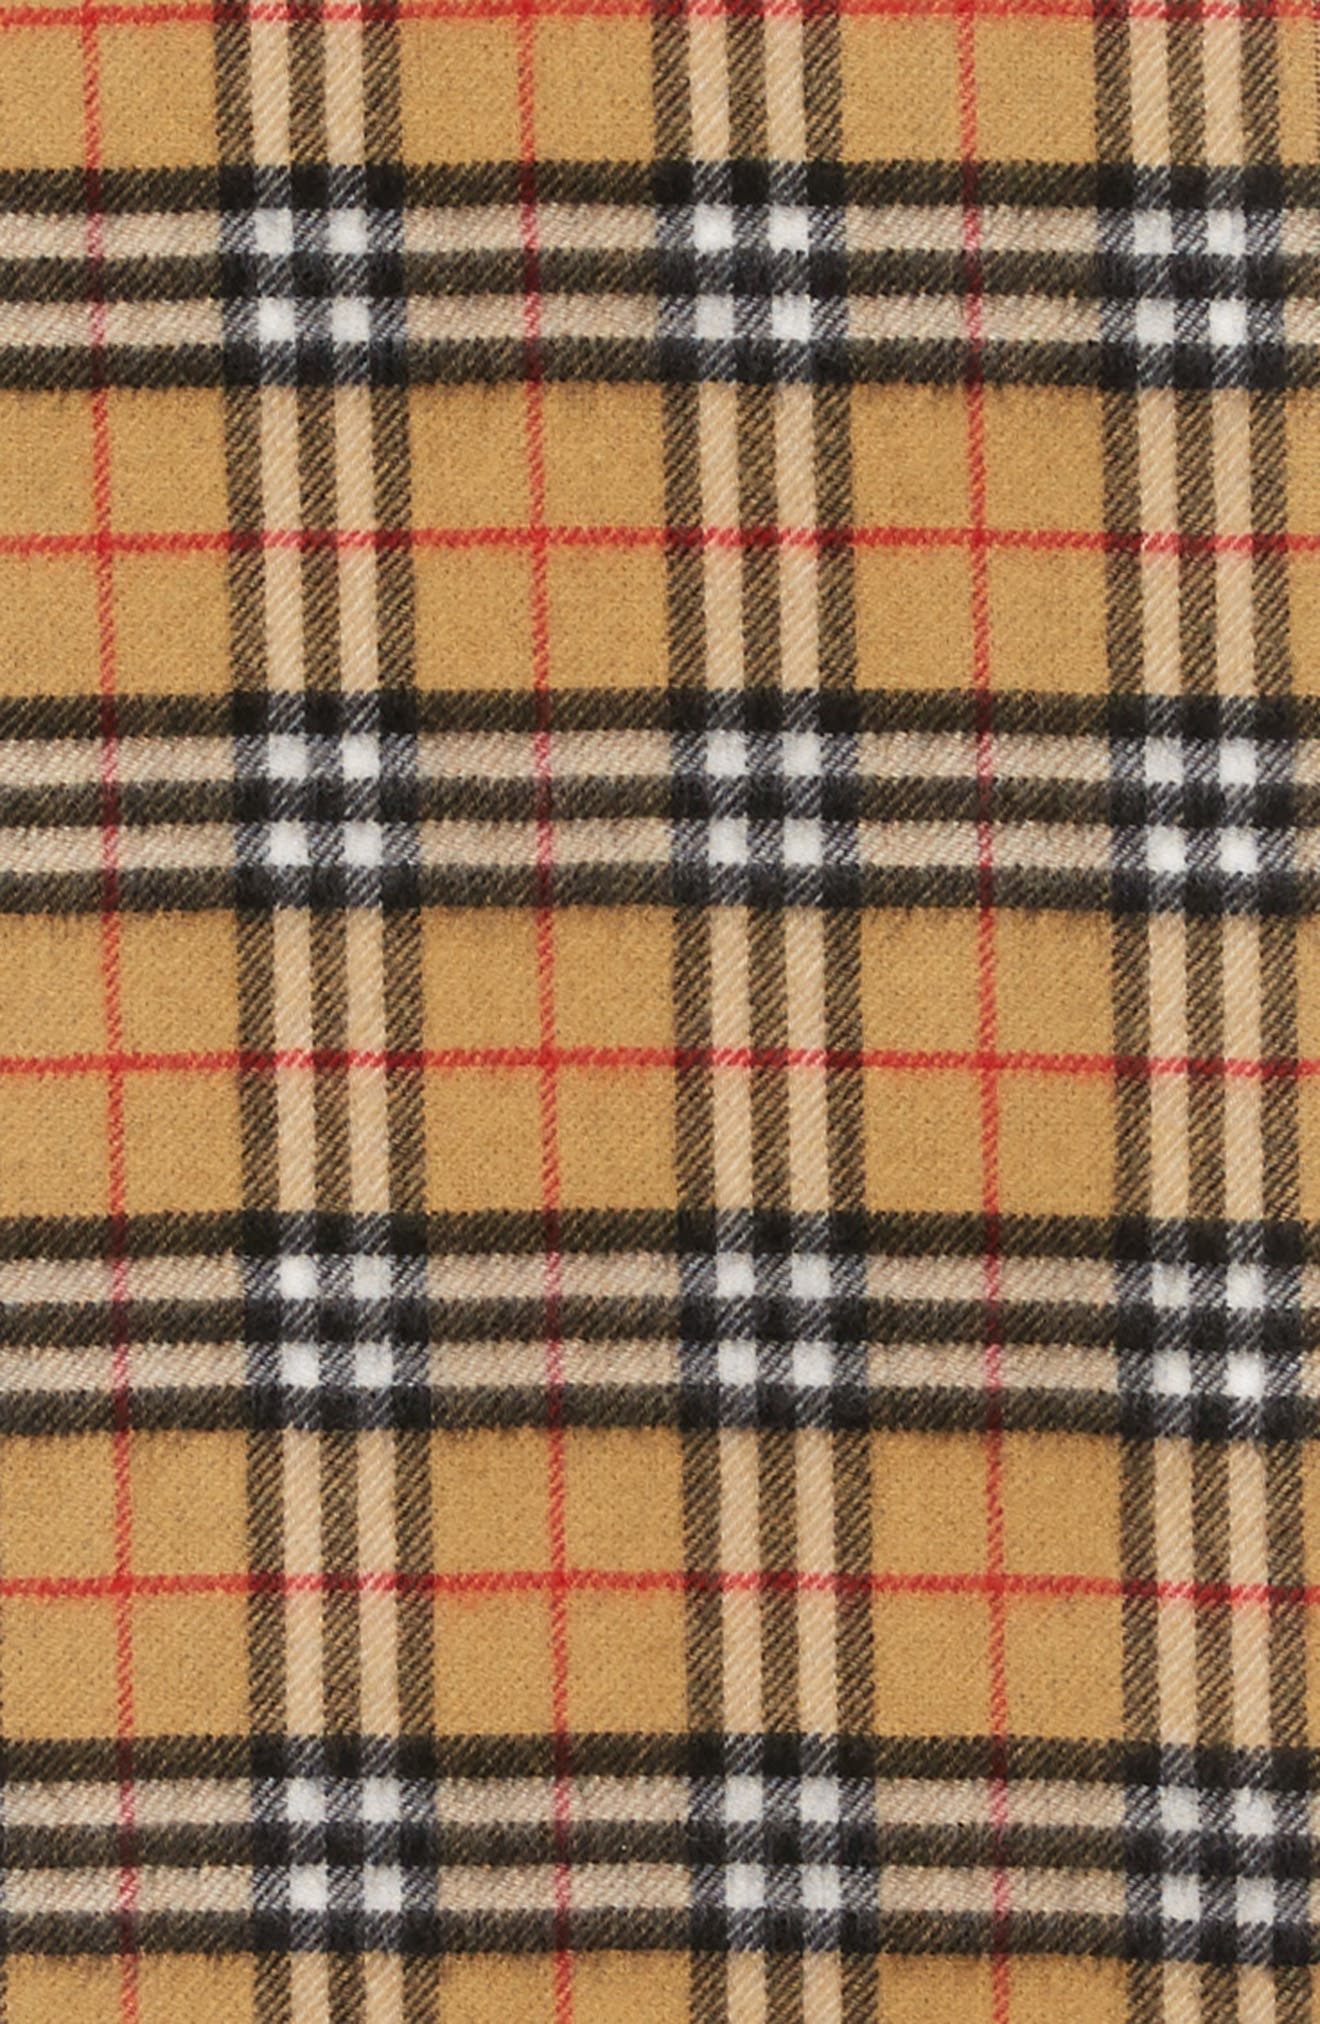 Reversible Vintage Check Cashmere Scarf,                             Alternate thumbnail 4, color,